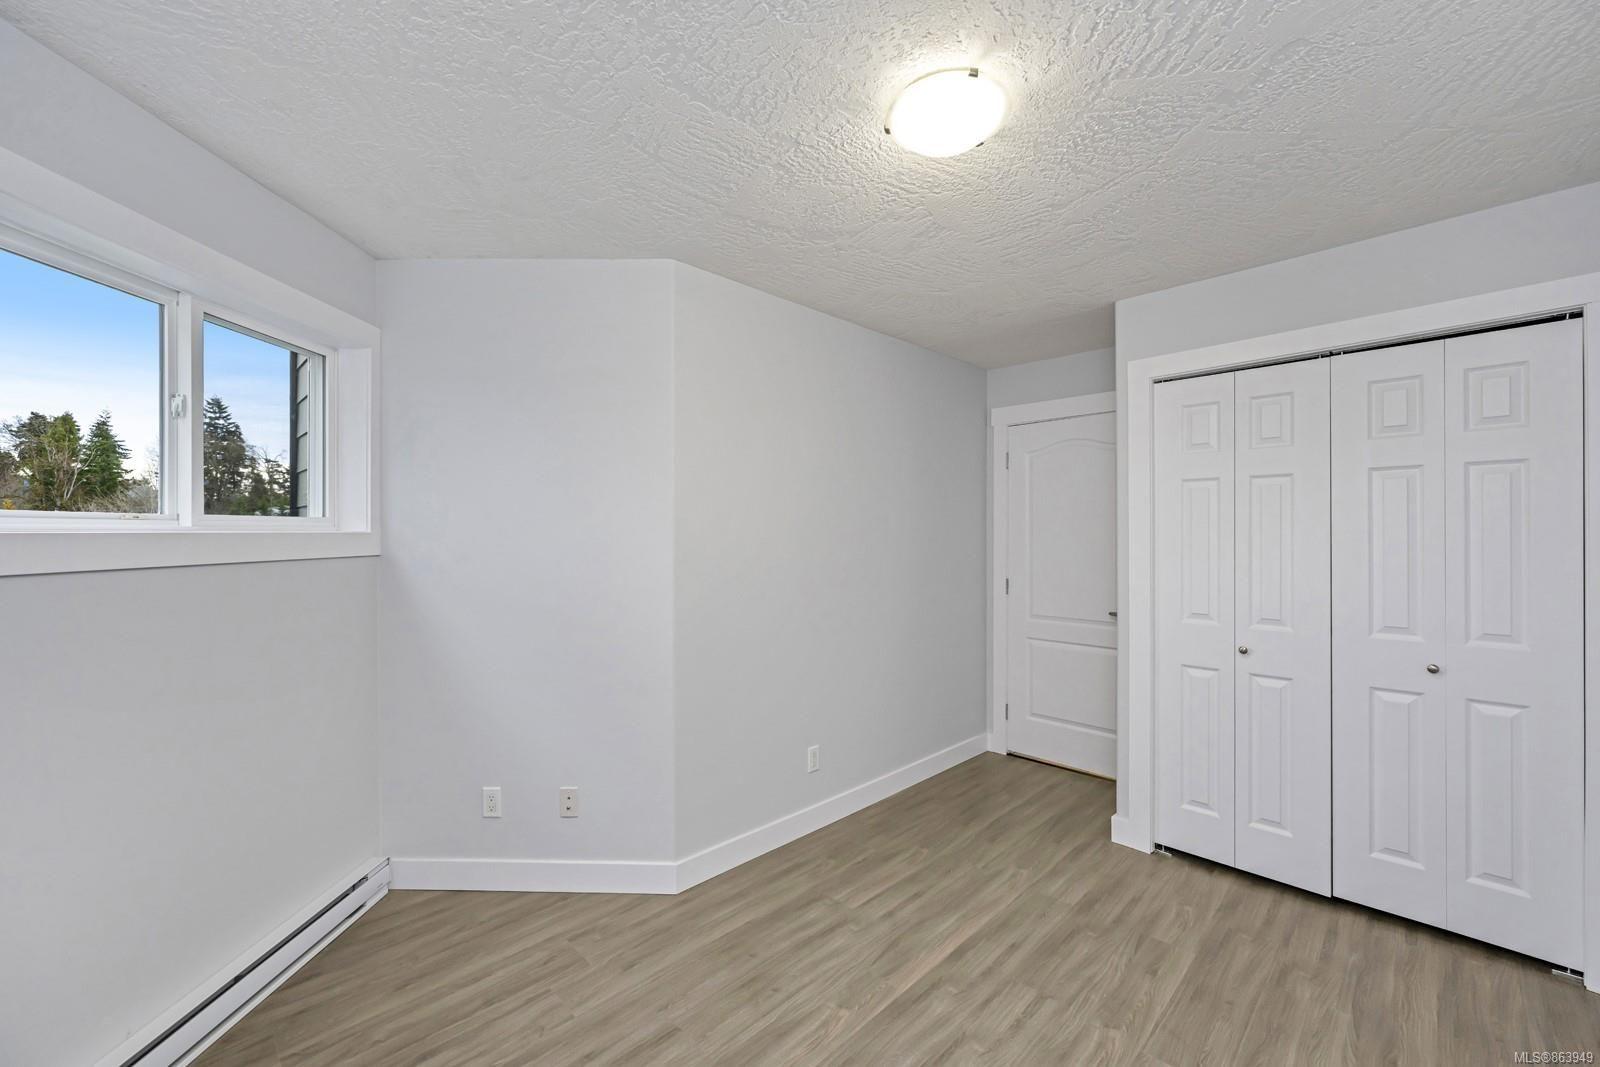 Photo 23: Photos: 6154 Sayward Rd in : Du West Duncan Half Duplex for sale (Duncan)  : MLS®# 863949